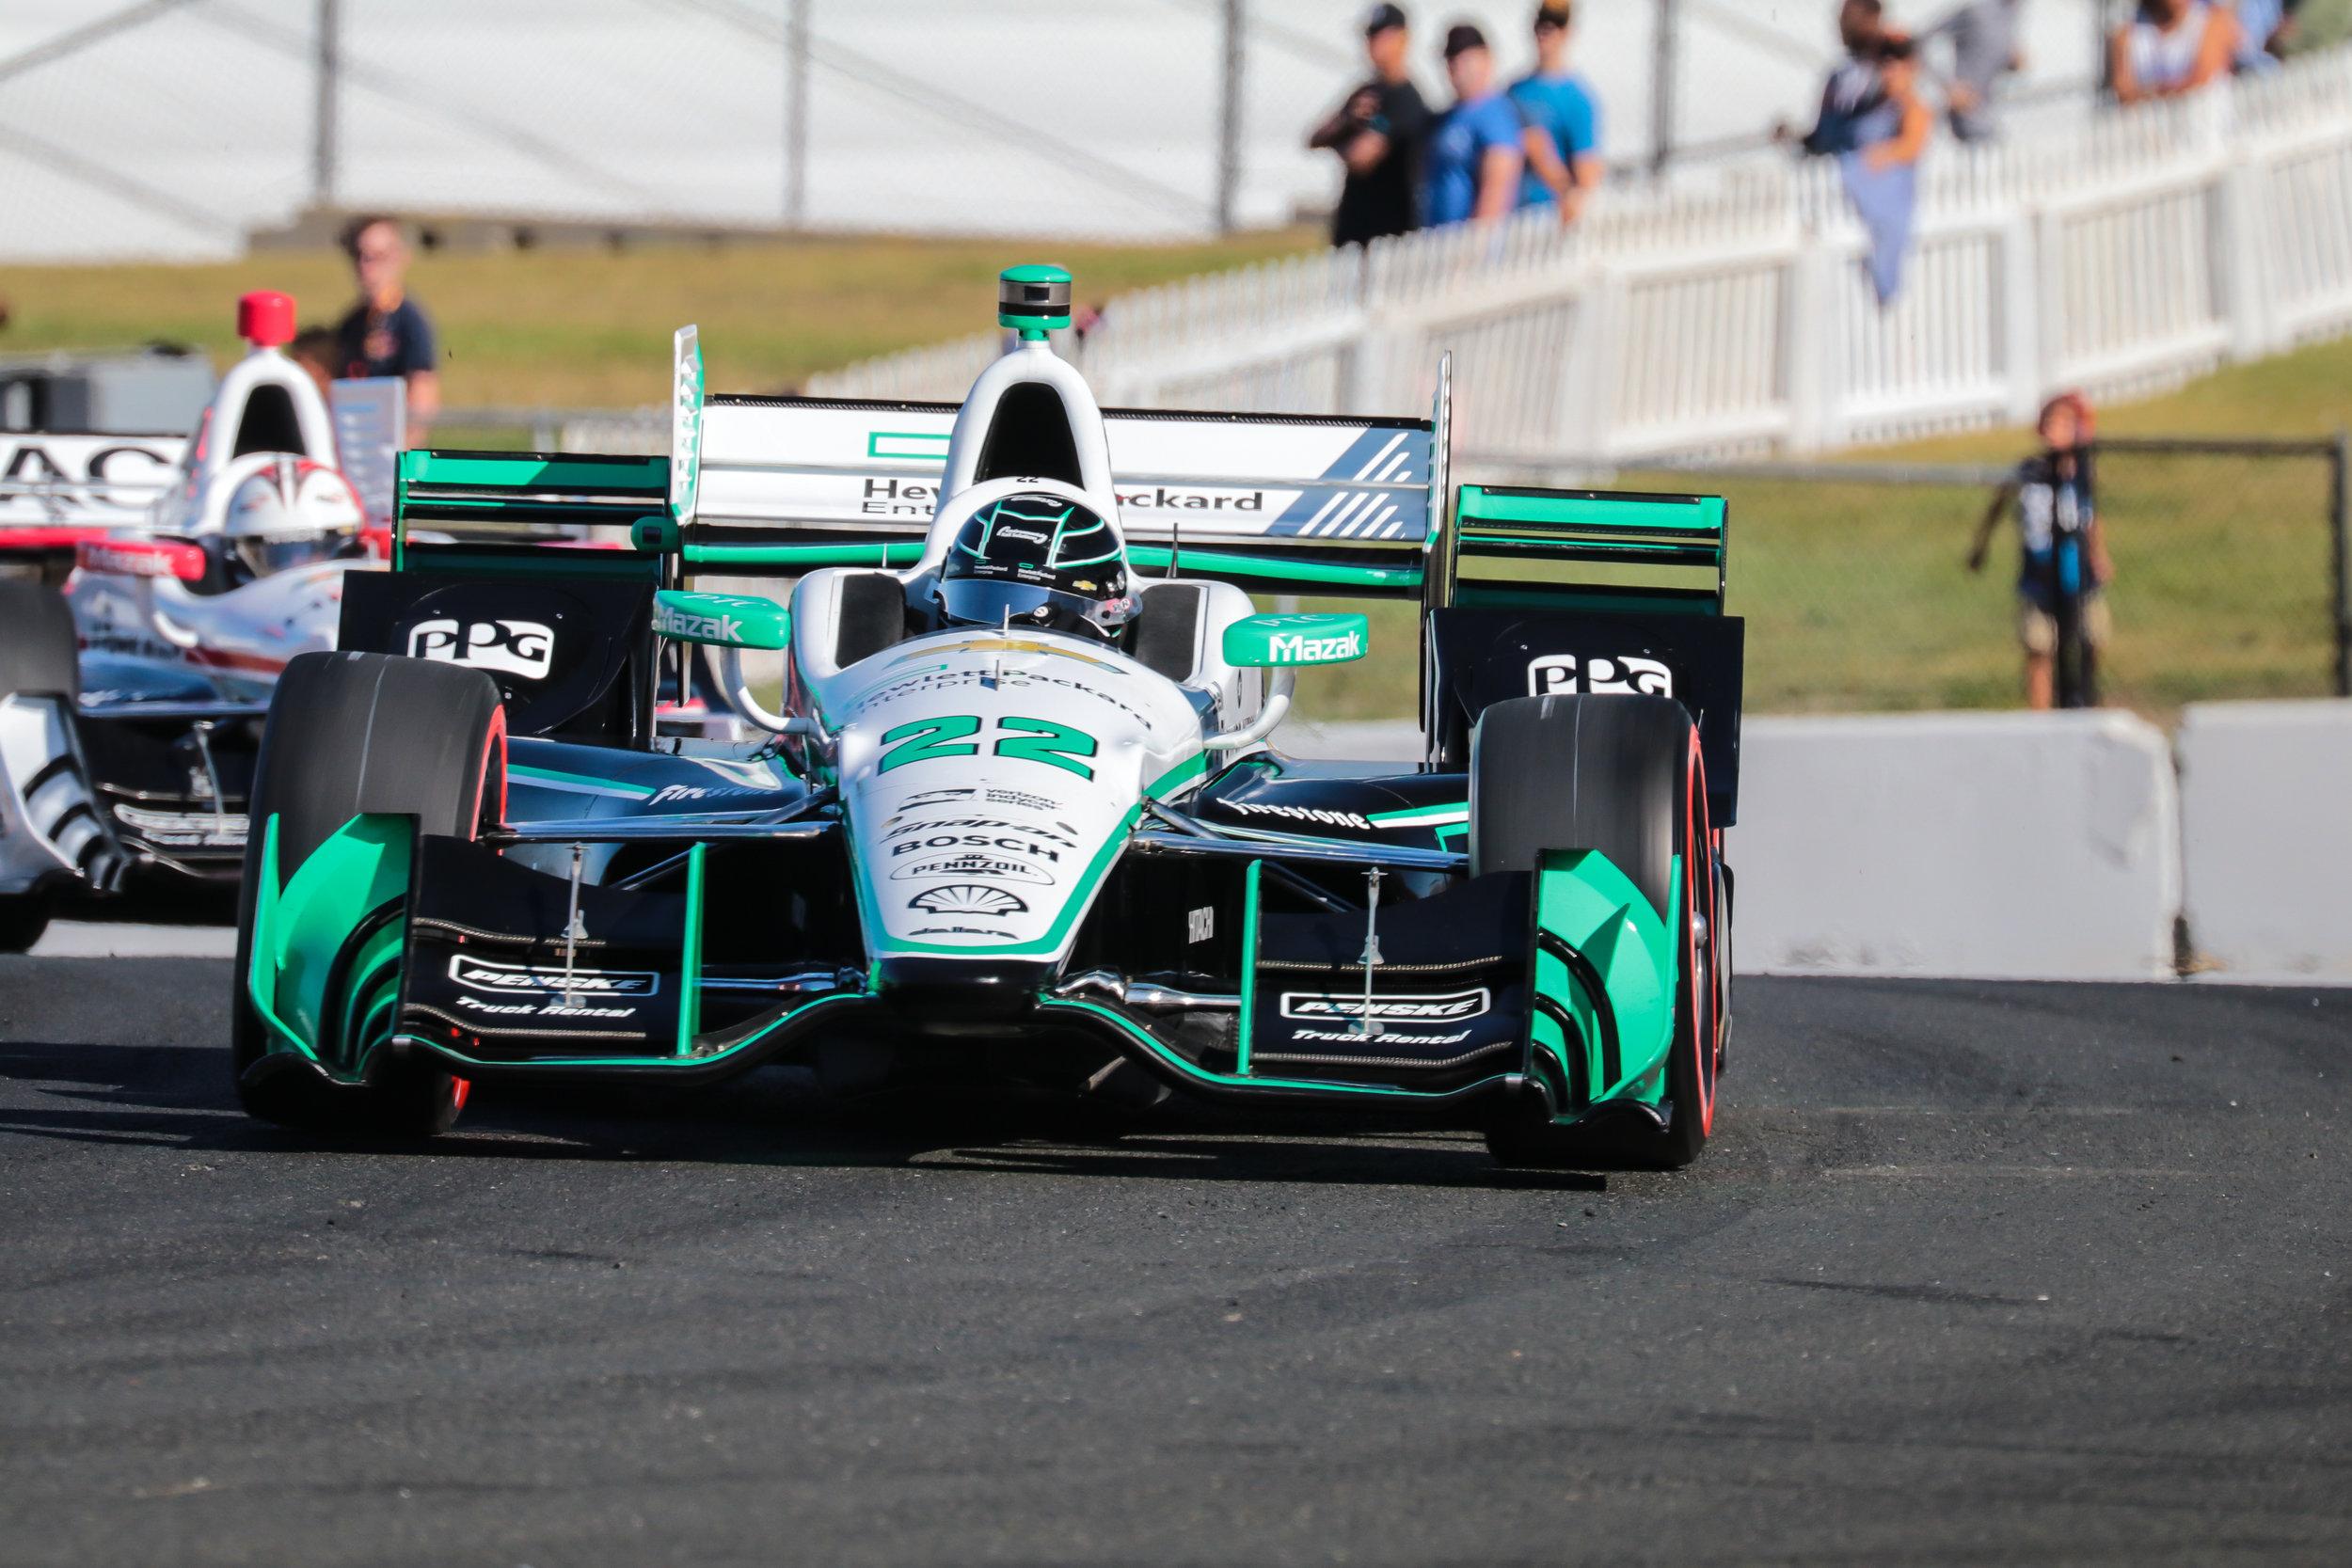 Indy16-2802.jpg